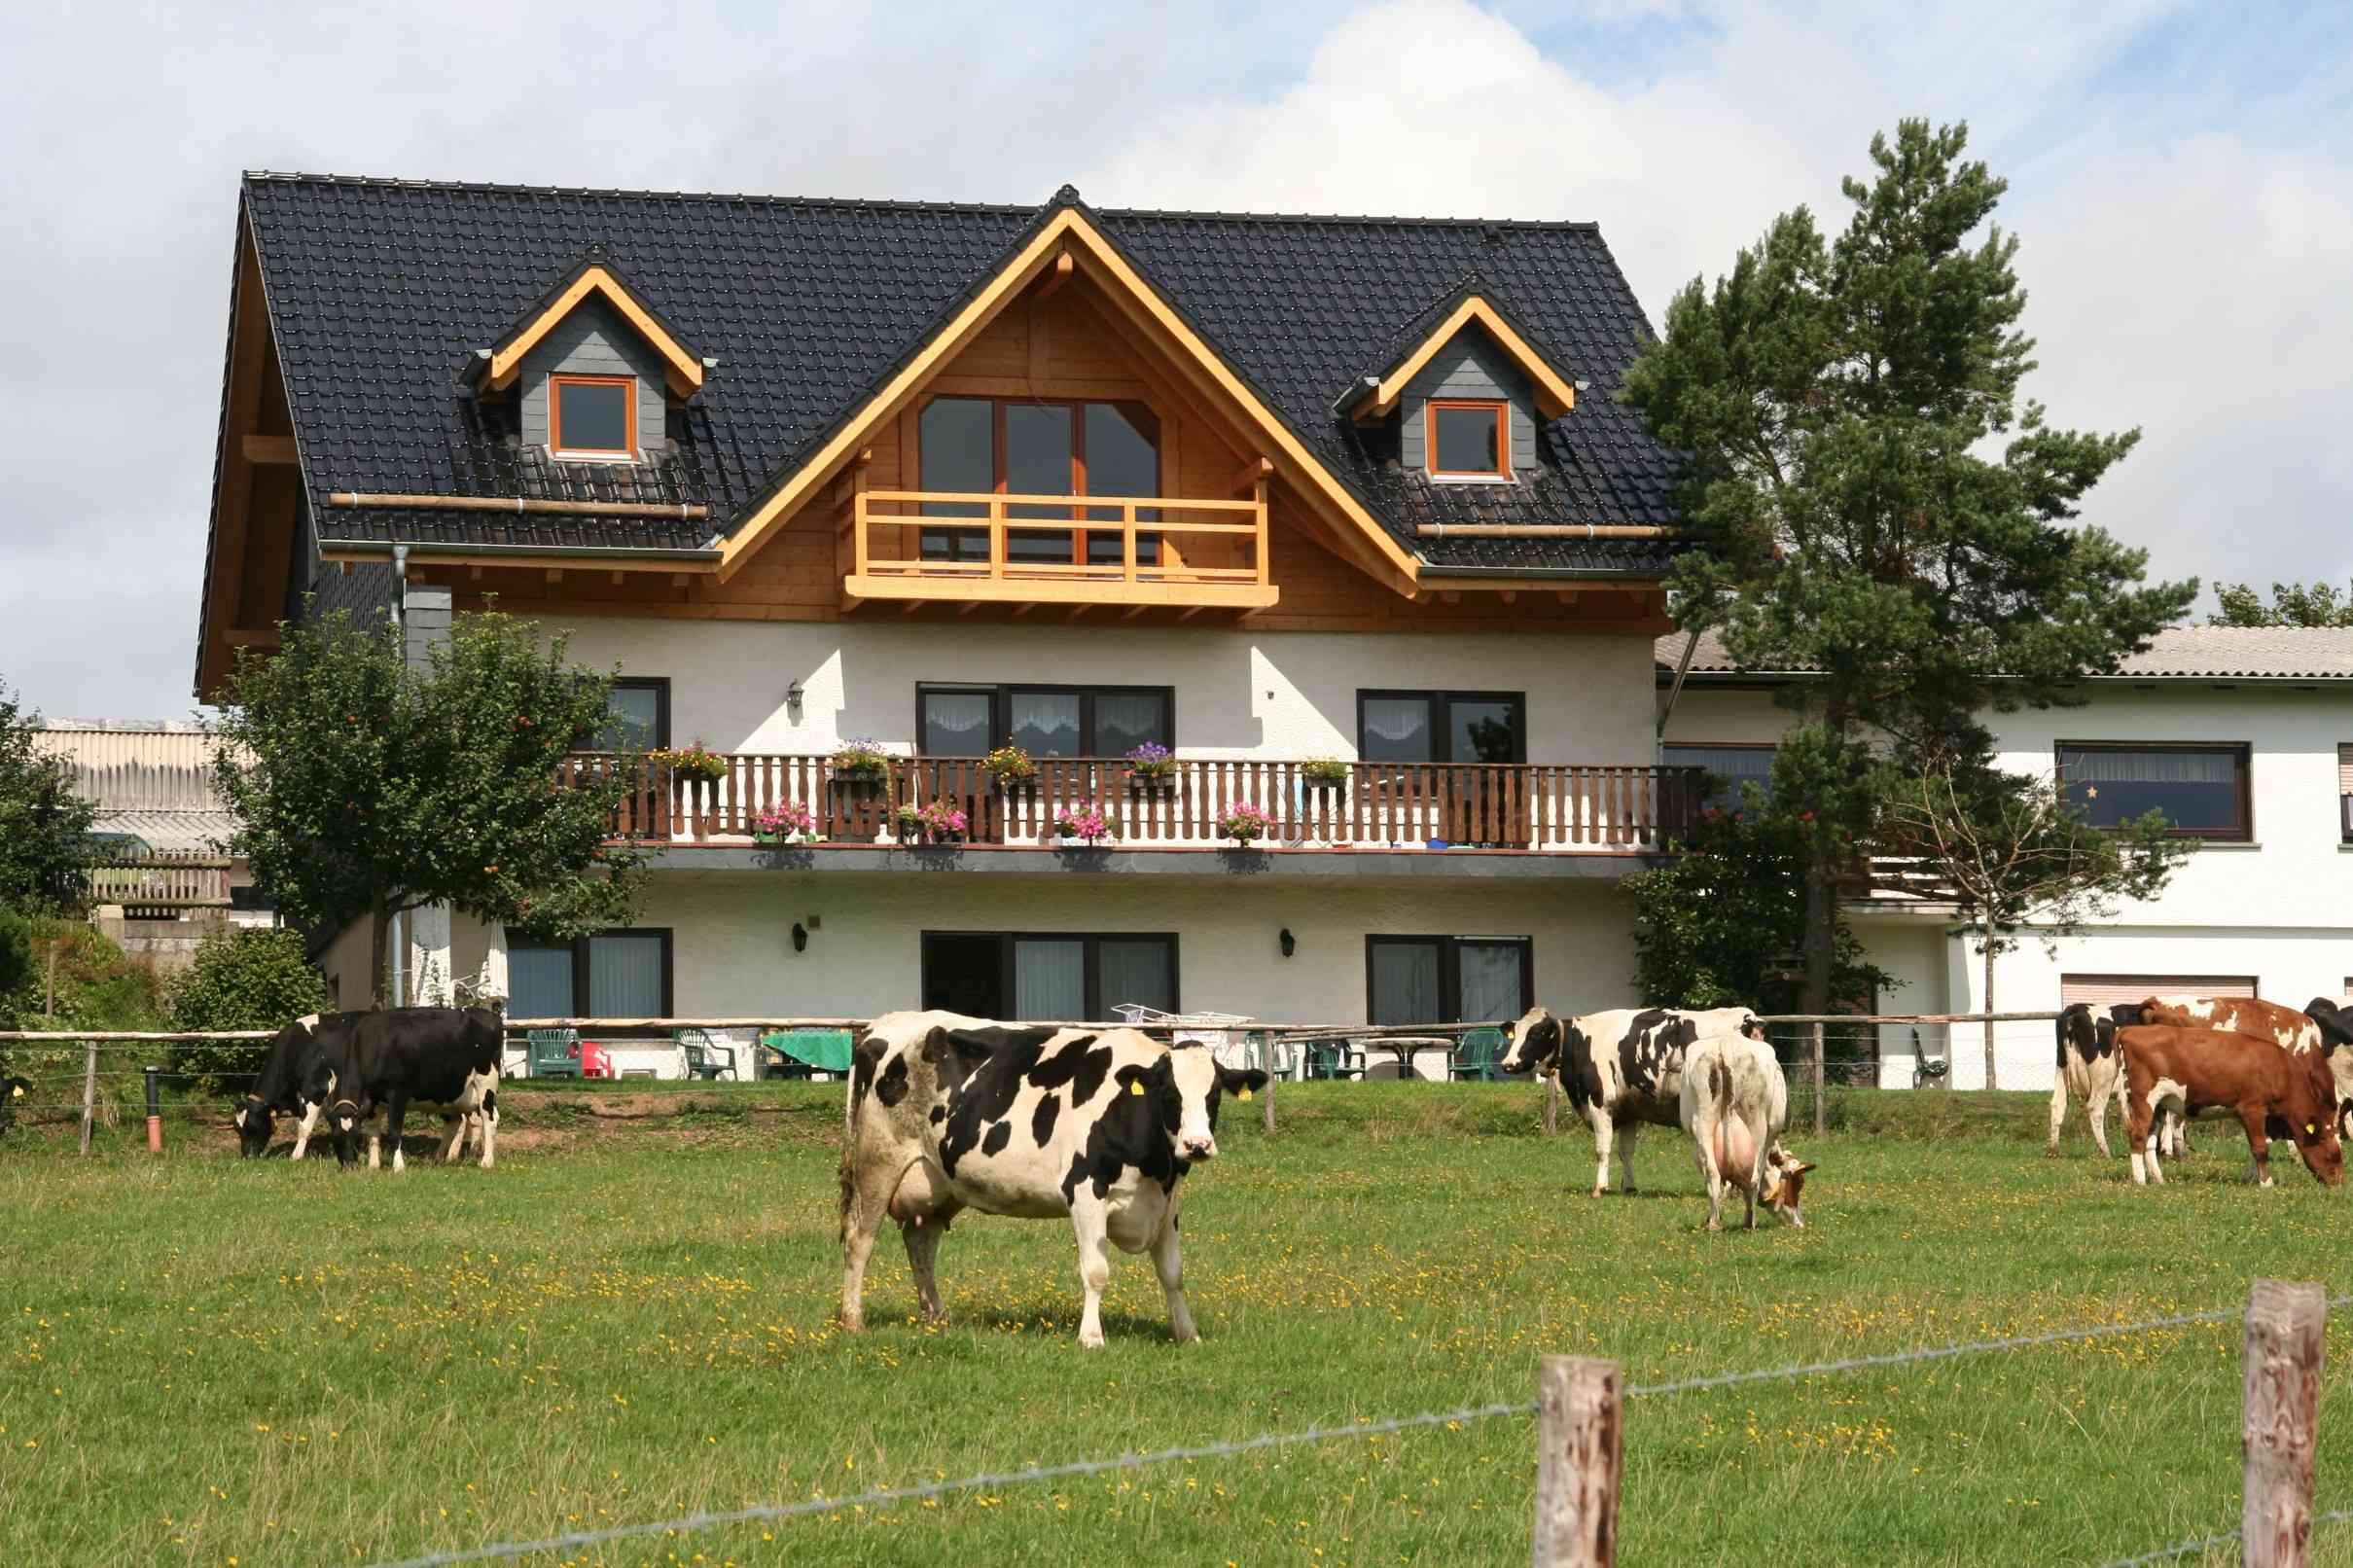 Ferienwohnung Heidehof Hermeling Blankenheim Freilingen - Anbieter Hermeling